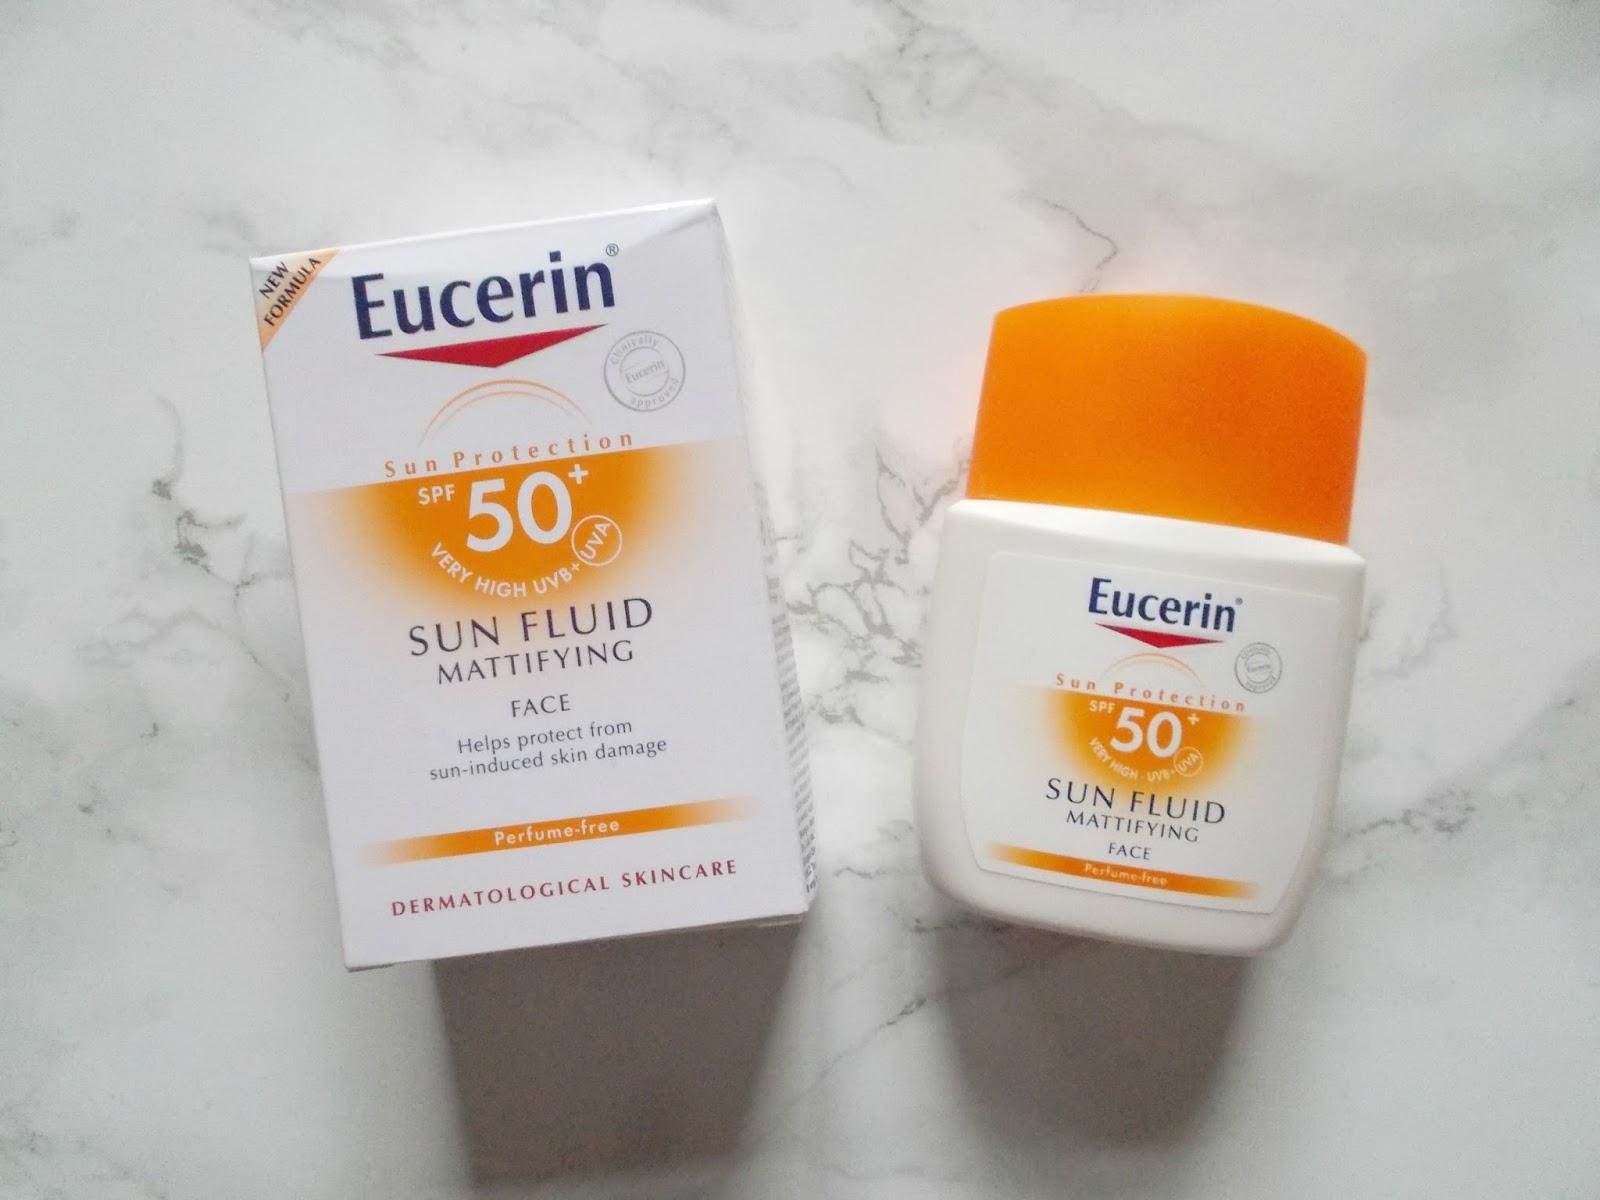 Eucerin spf 50 mattifying sun fluid face